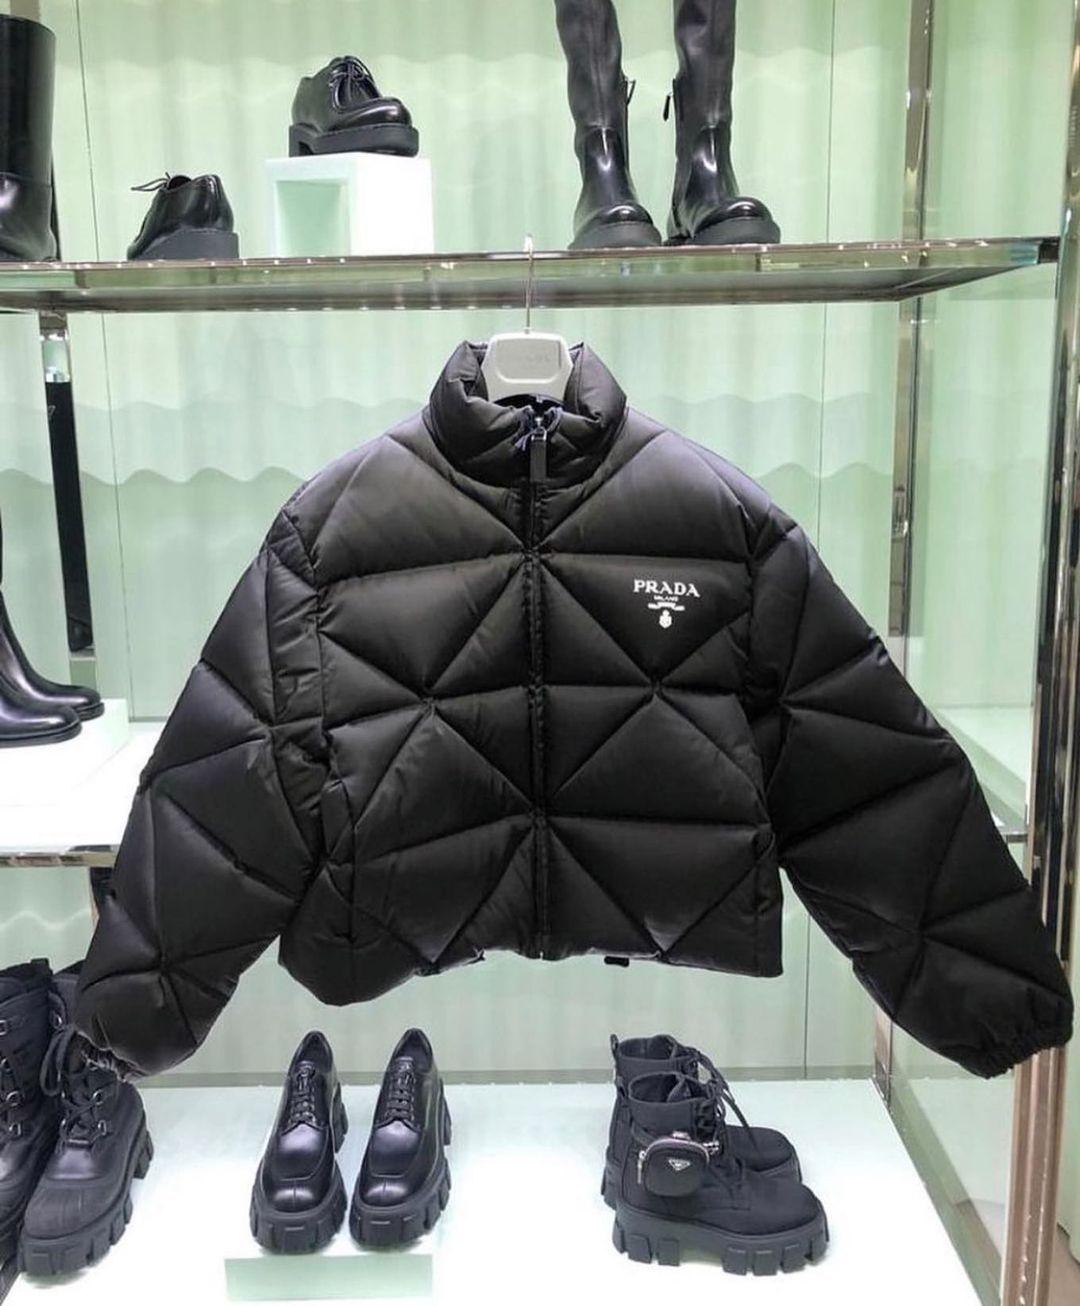 Unreap On Instagram Prada Puffer Jacket Unreap In 2021 Fashion Prada Jacket Prada [ 1306 x 1080 Pixel ]